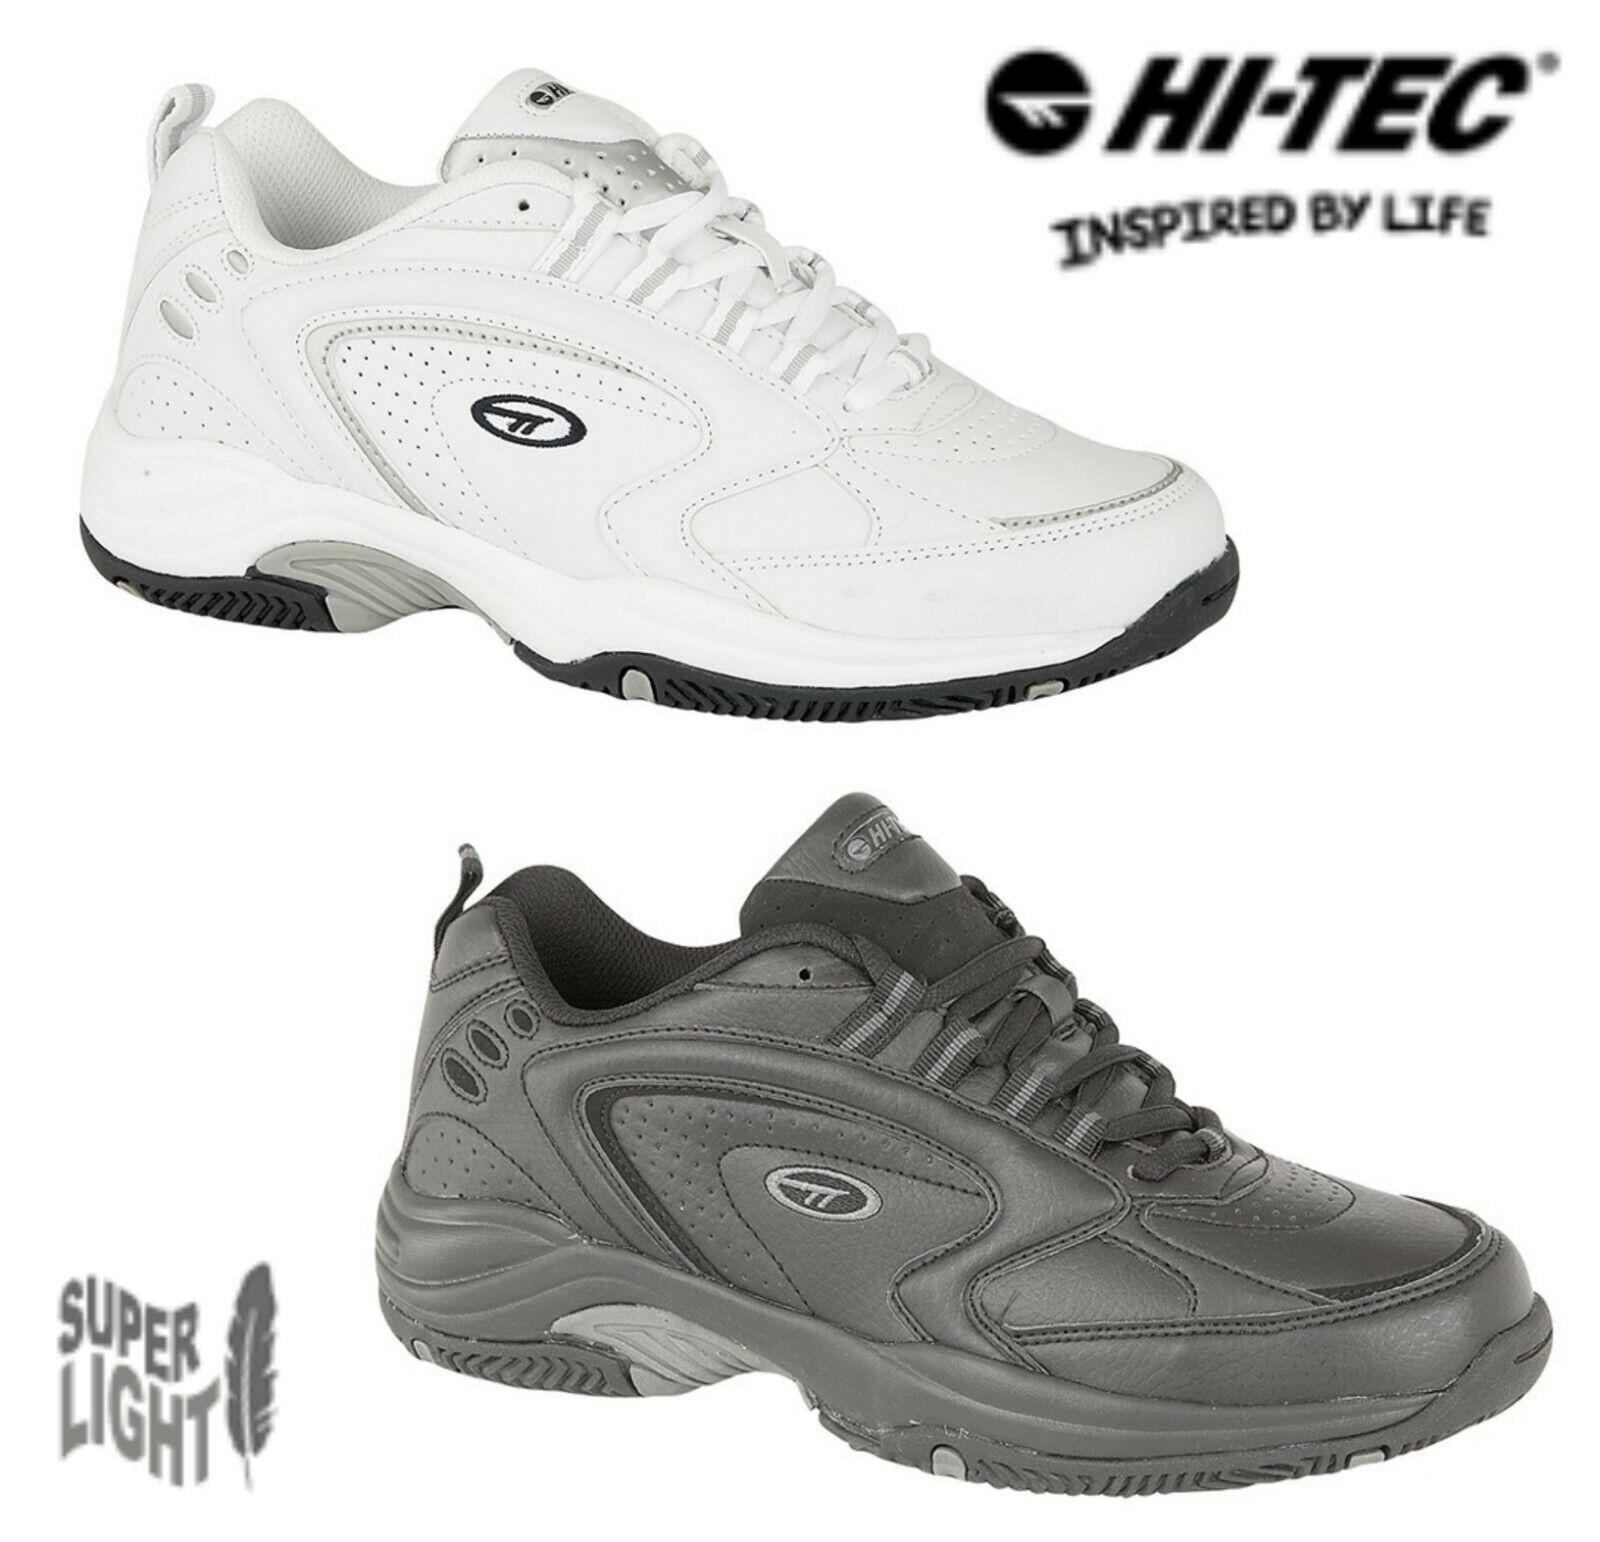 HI-TEC BLAST LITE Lightweight Non-Marking Trainers - White or Black Sizes 6-16